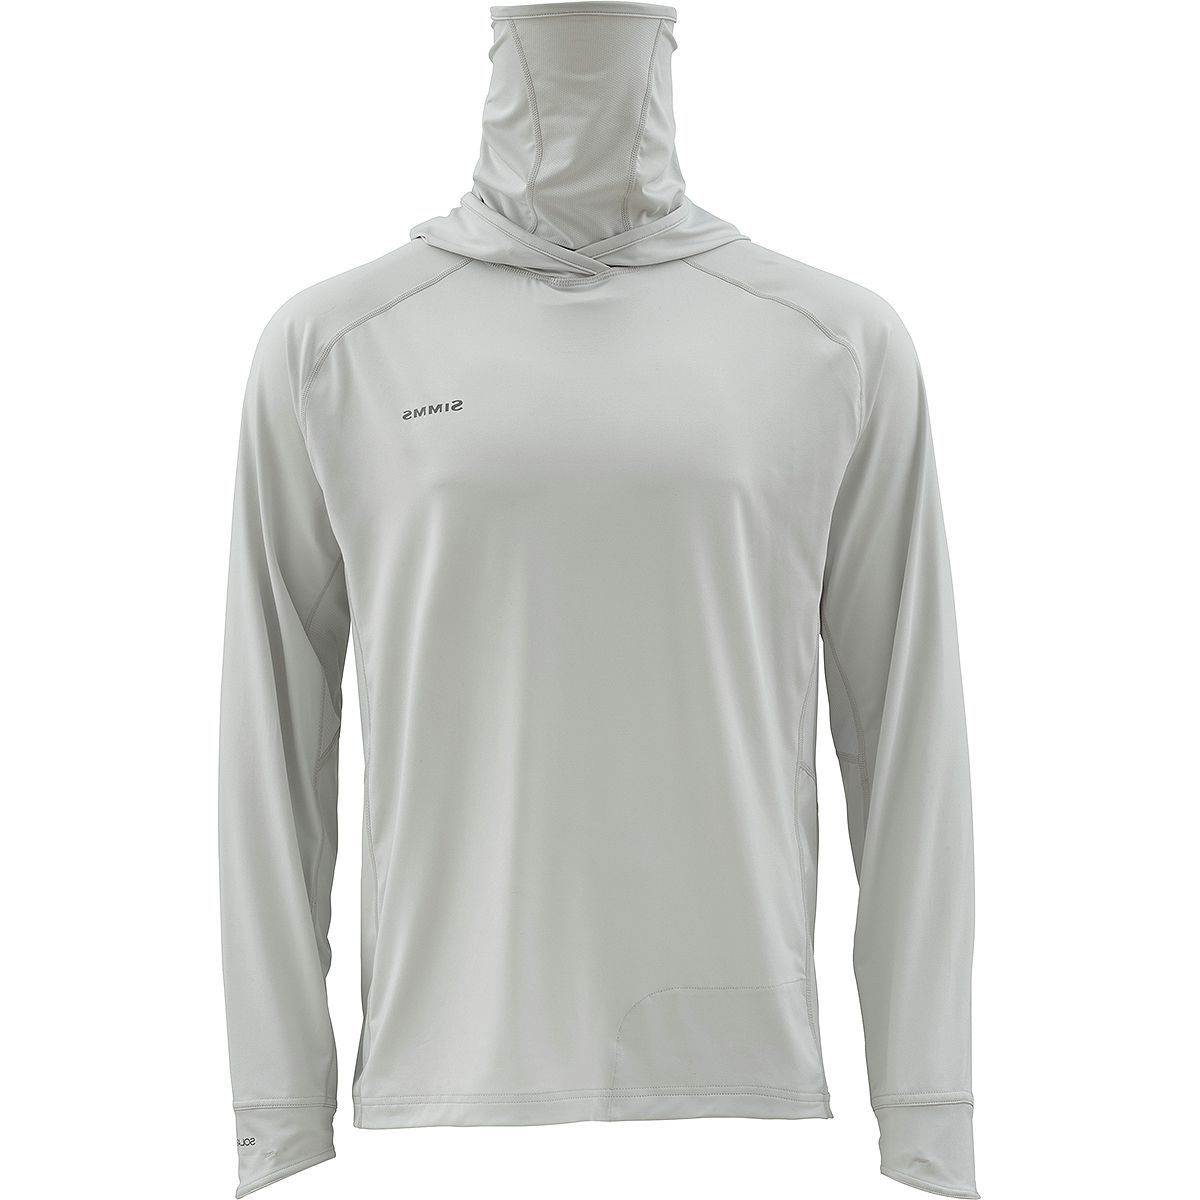 Simms SolarFlex Armor Shirt - Men's